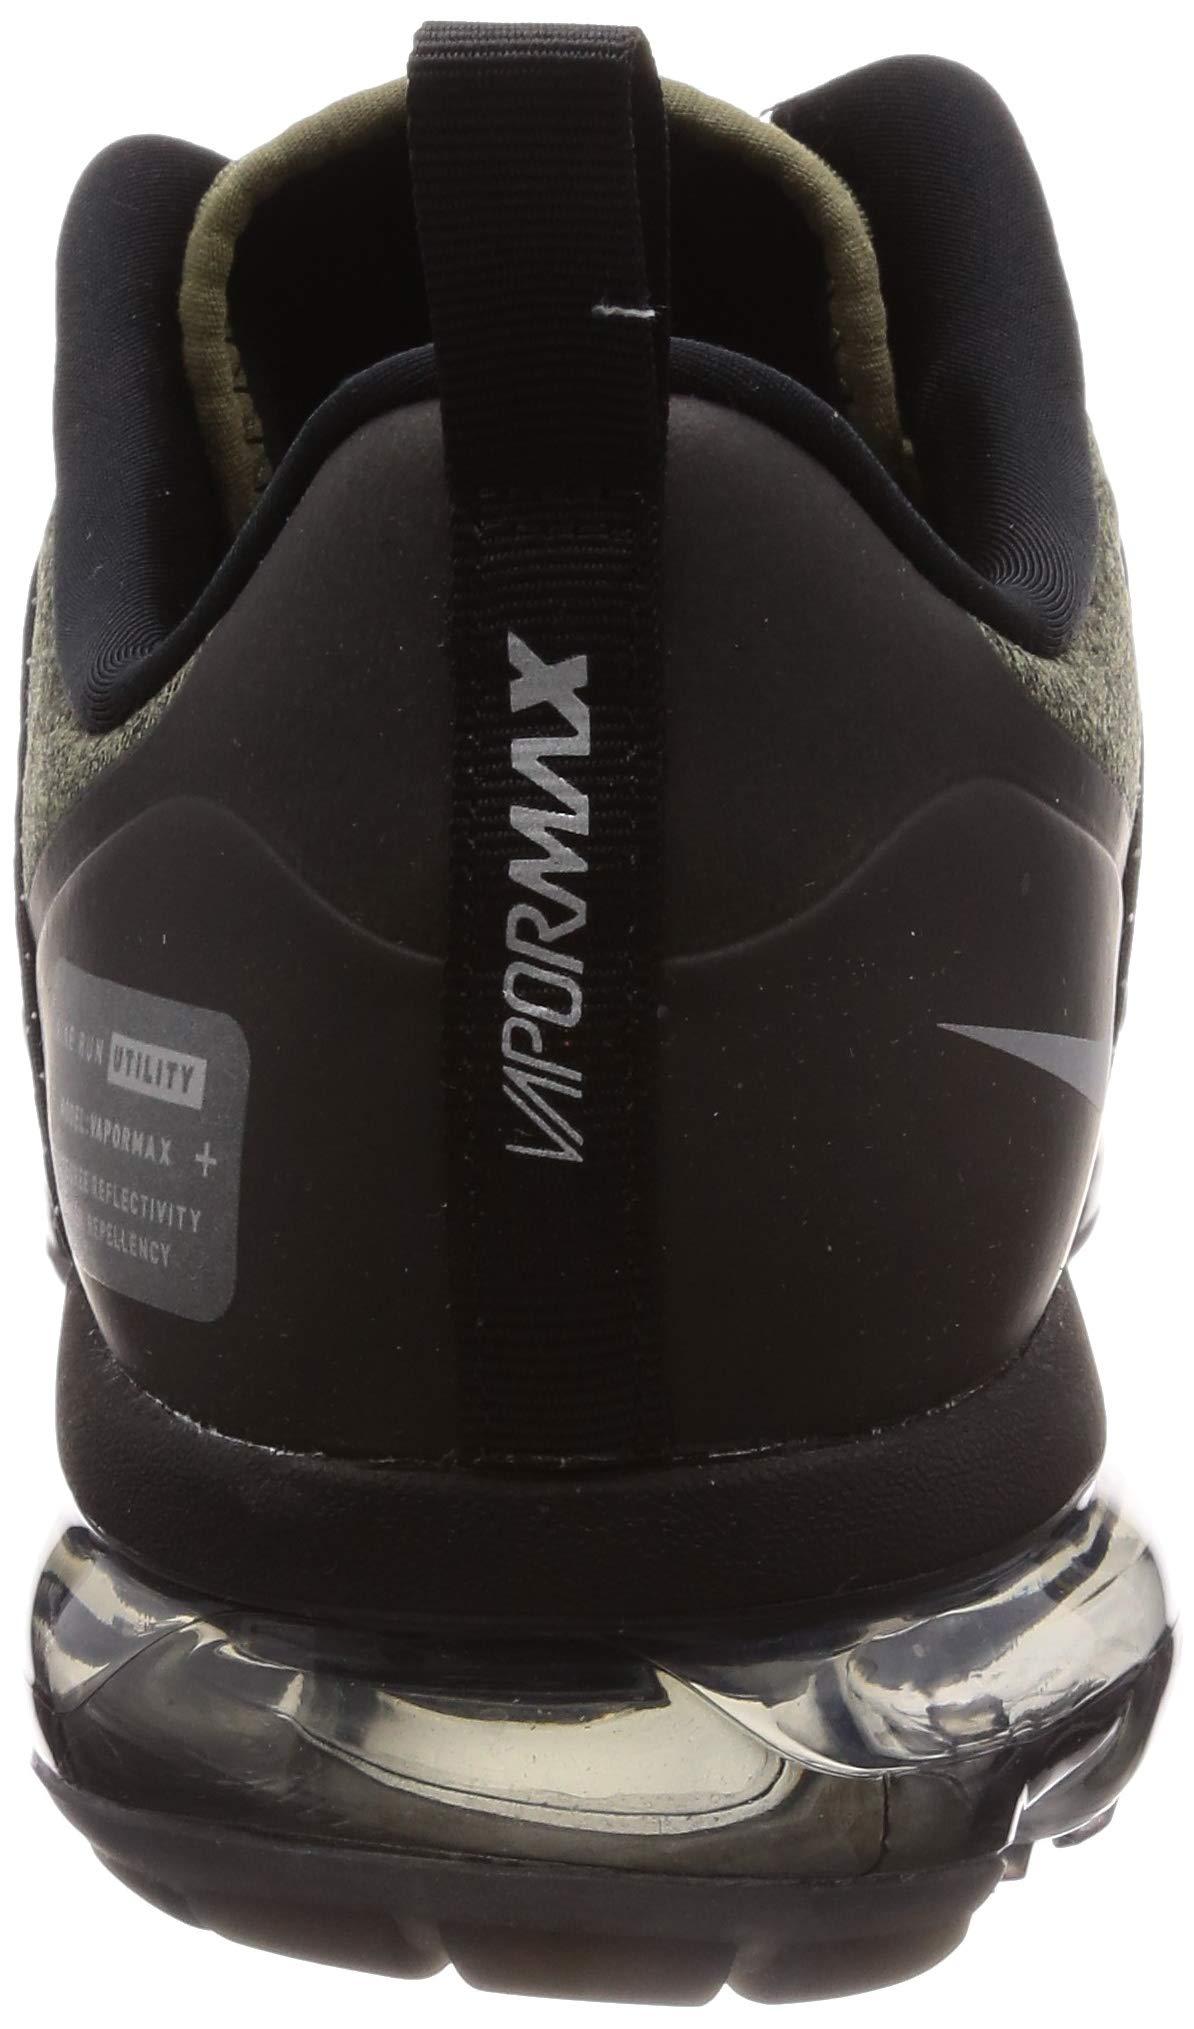 71QtJBHD9 L - Nike Men's Air Vapormax Run Utility, Medium Olive/Reflect Silver